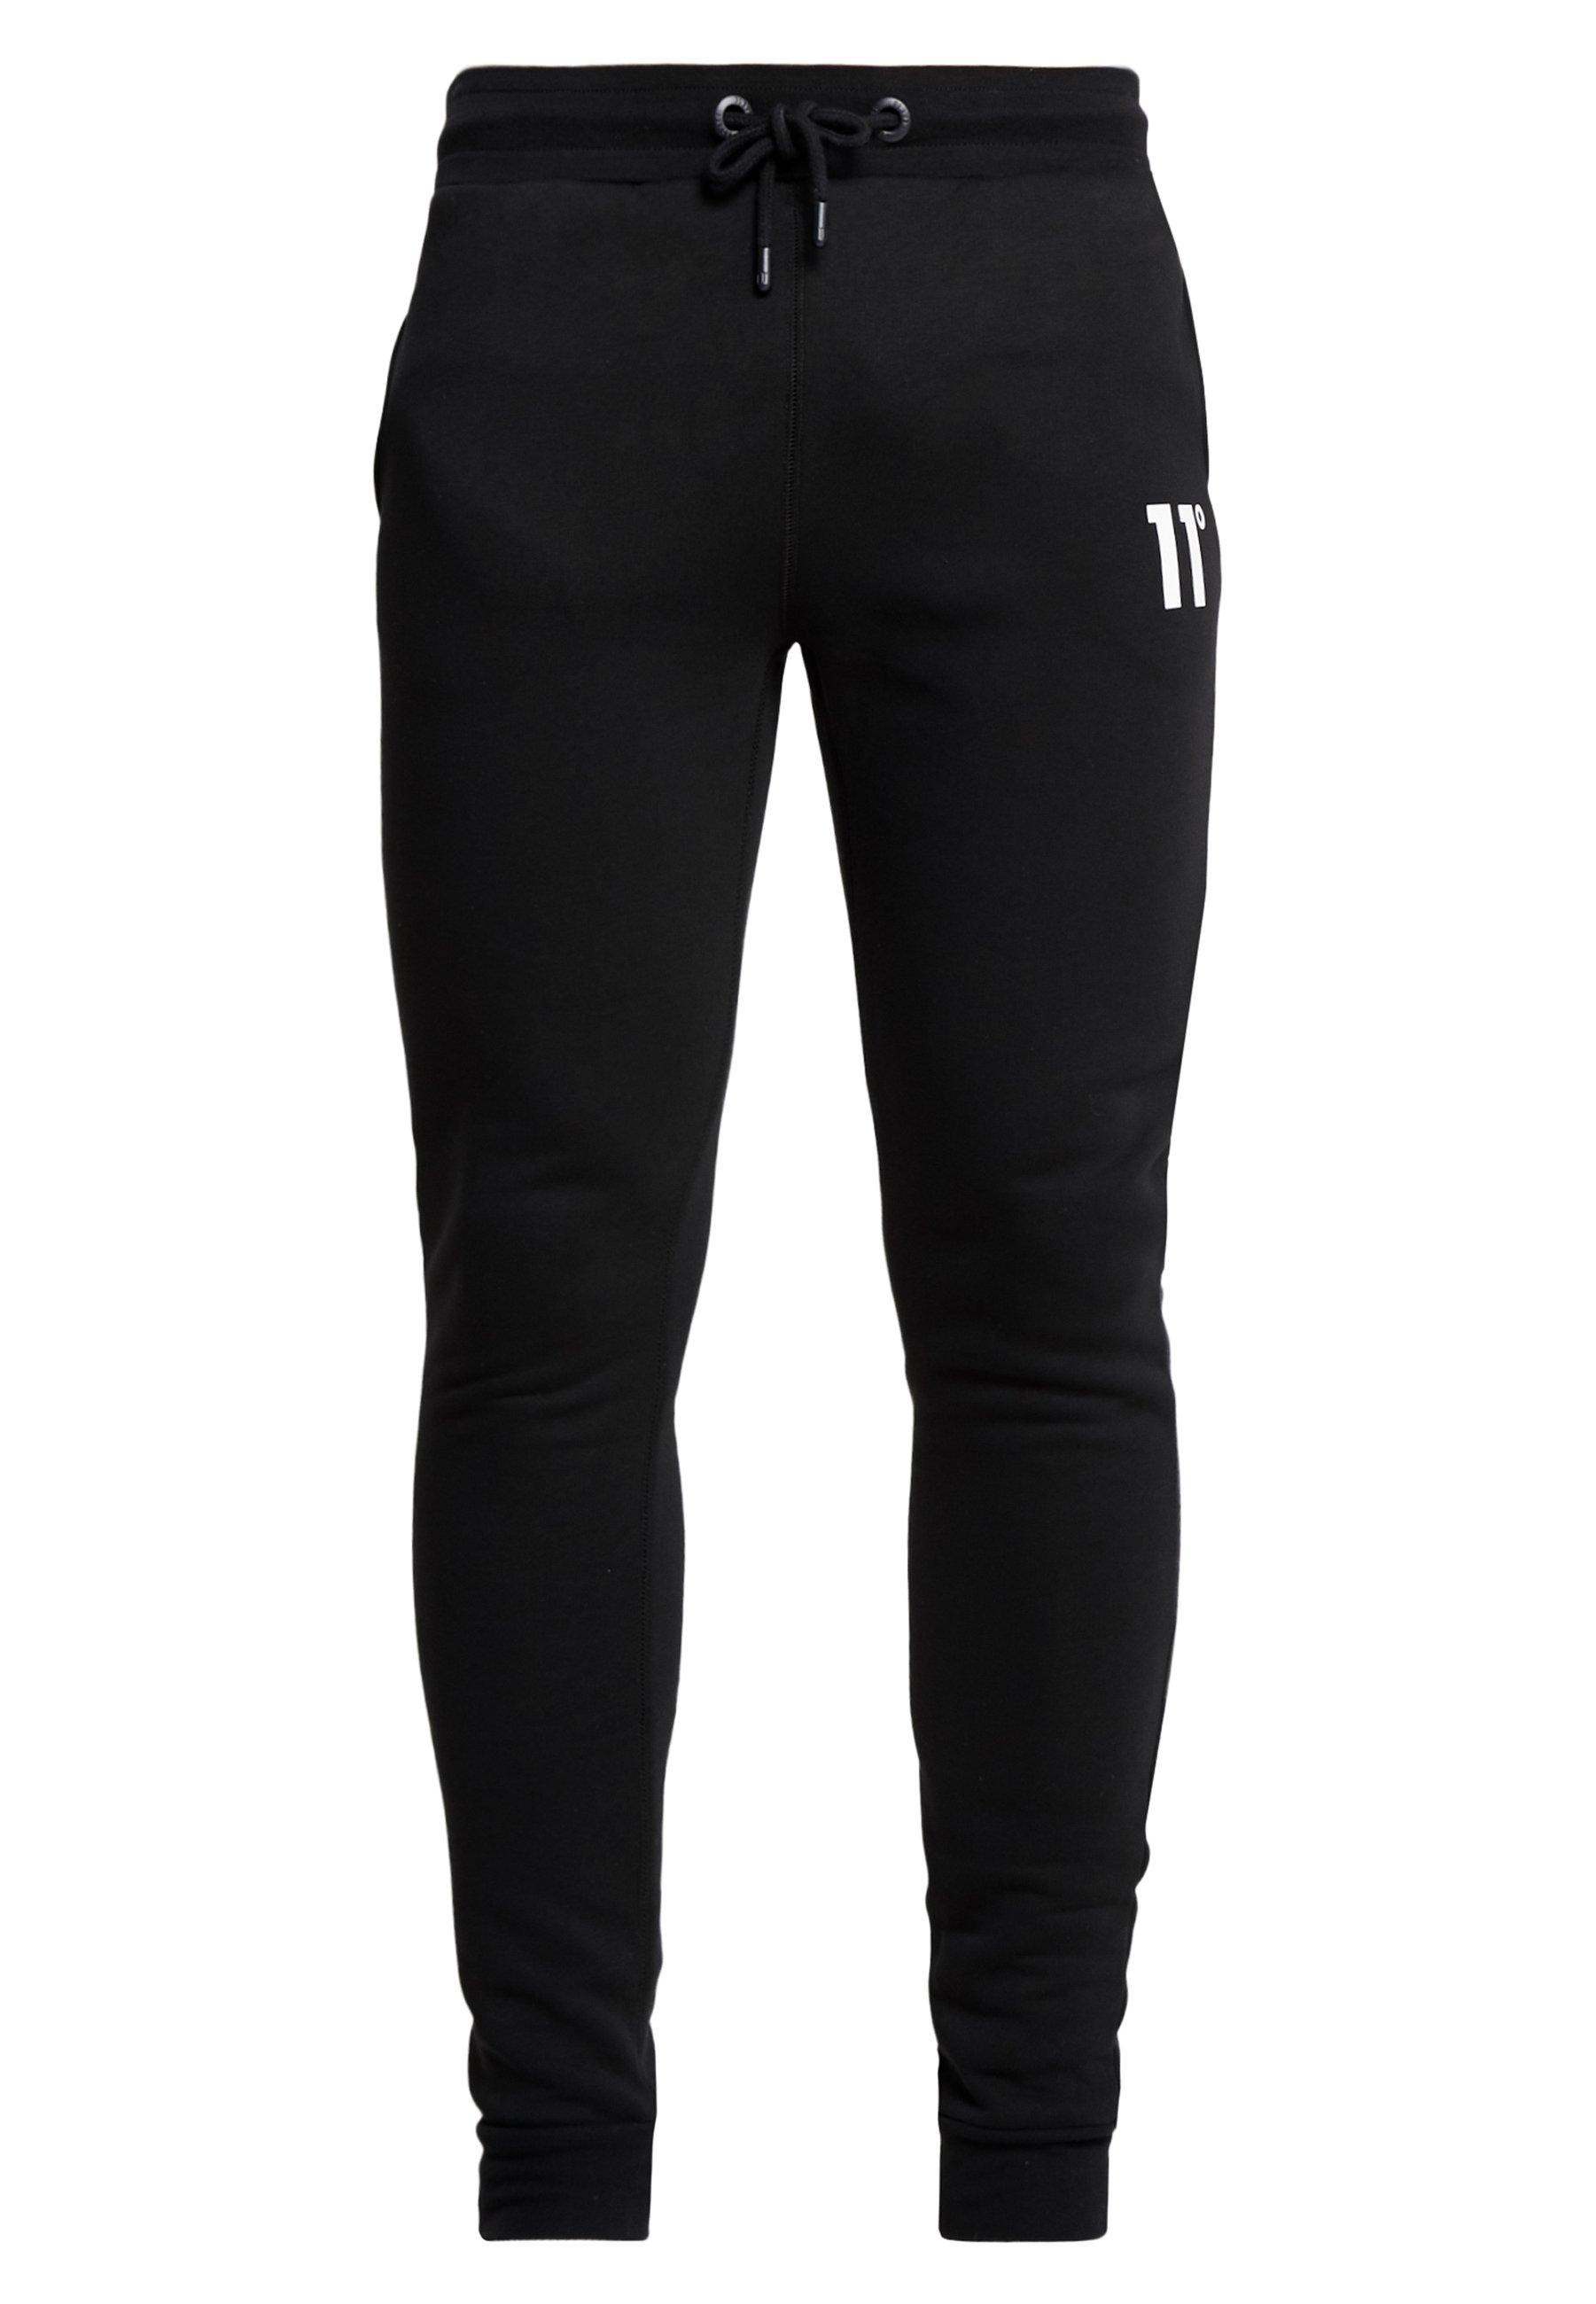 11 DEGREES CORE JOGGERS - Spodnie treningowe - black